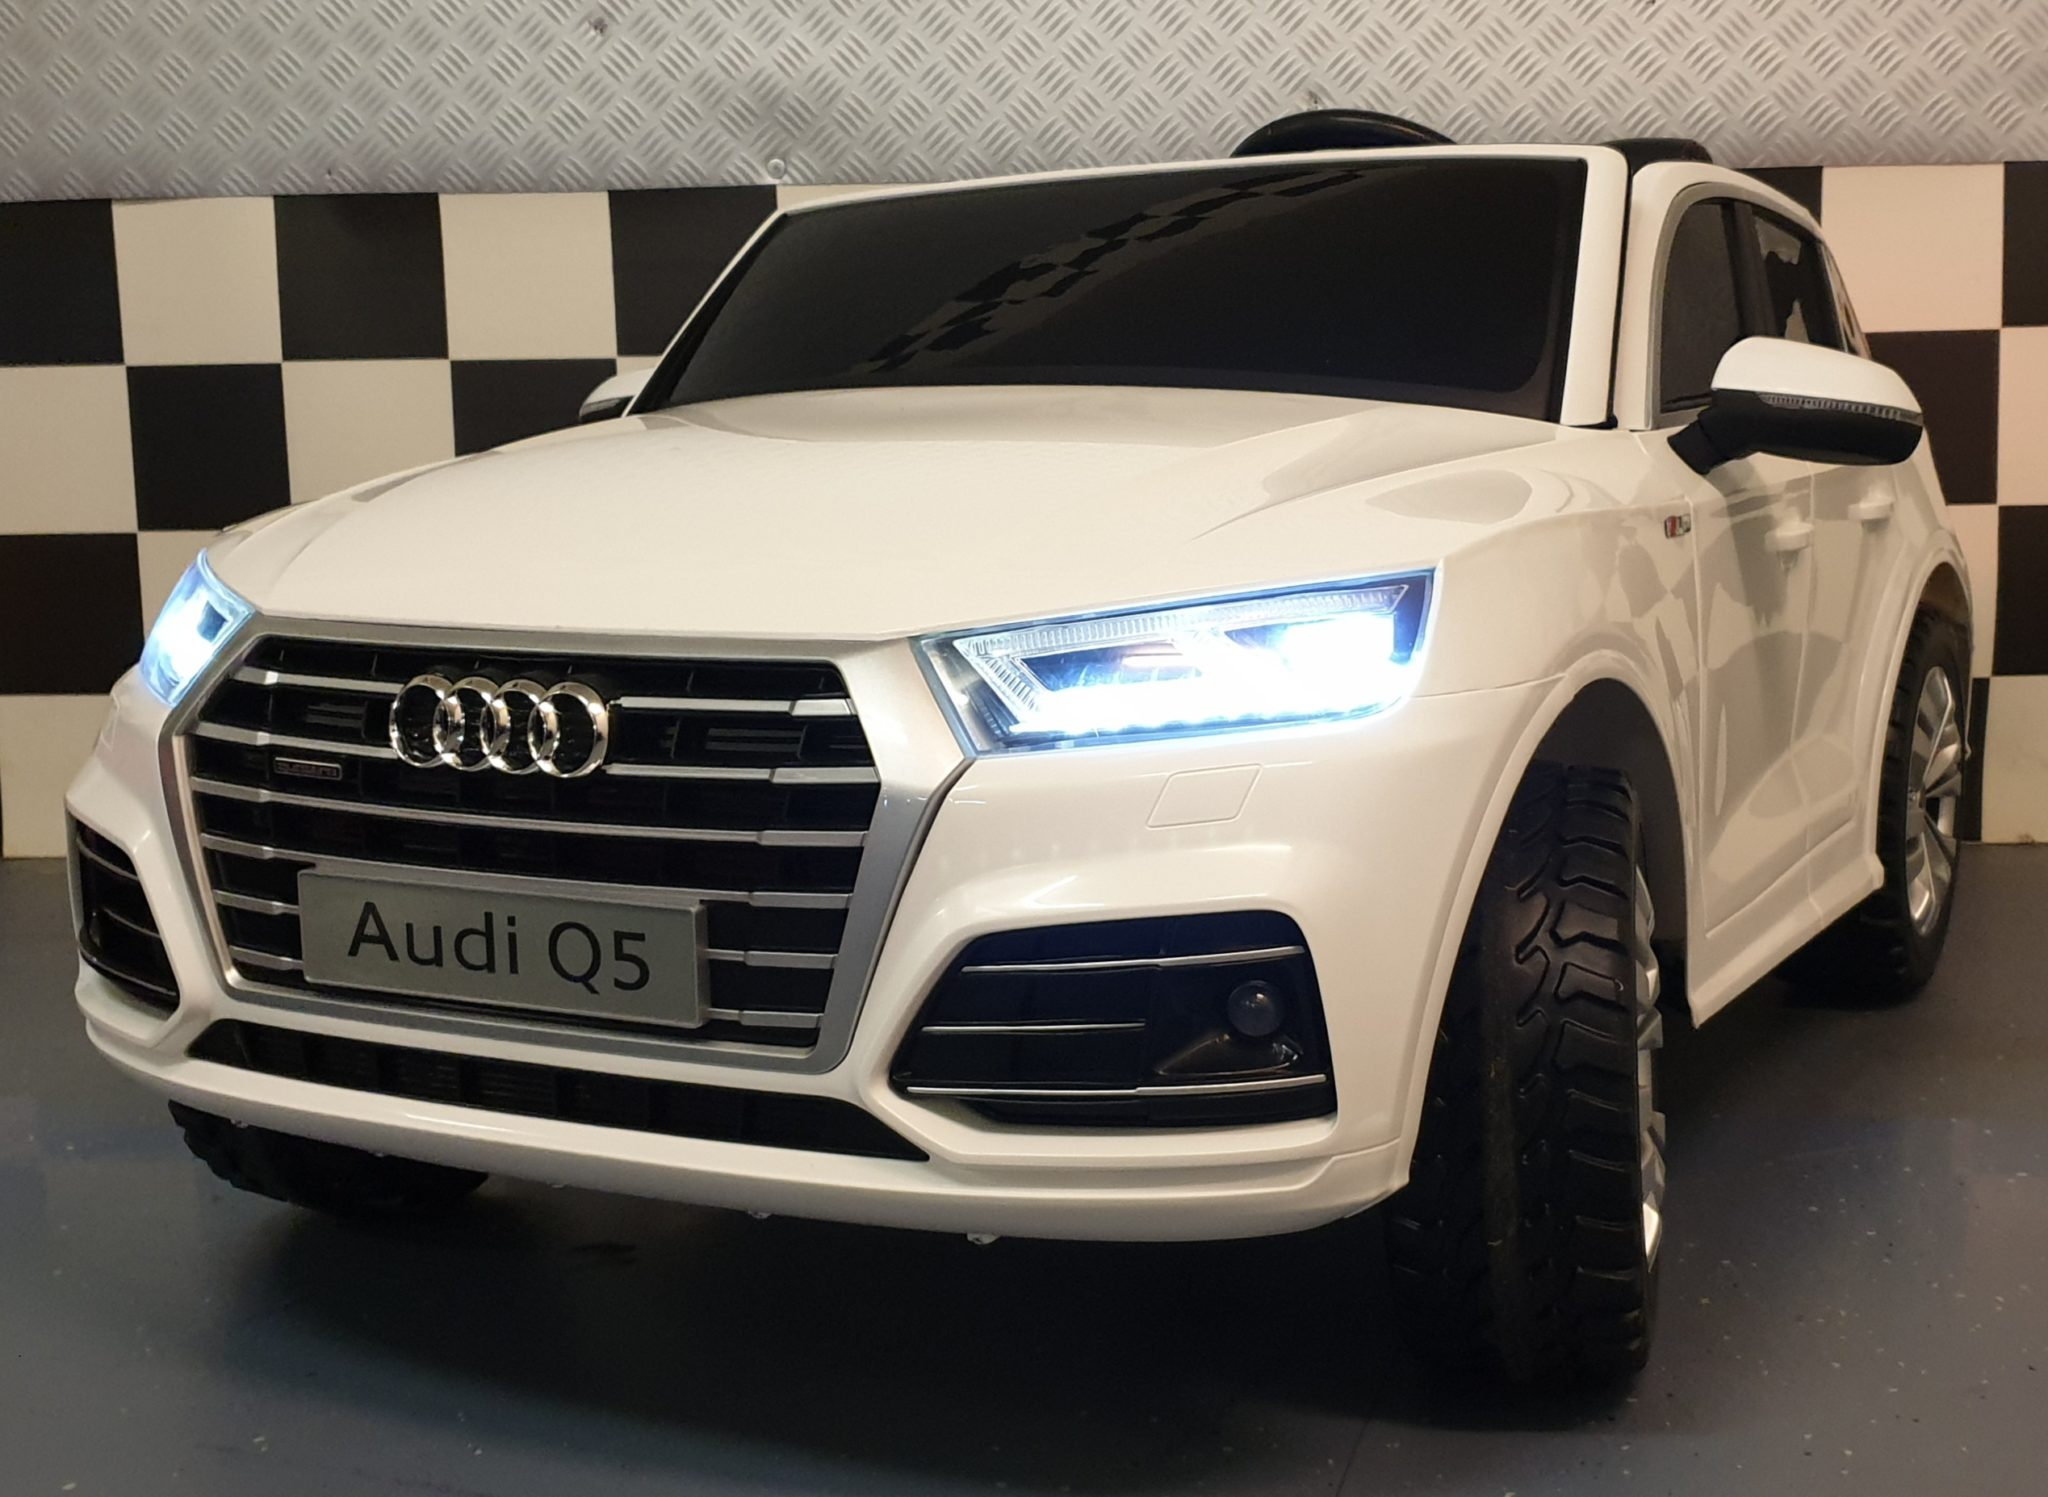 Elektrische kinderauto Audi Q5 2 persoons wit 2.4G 4WD